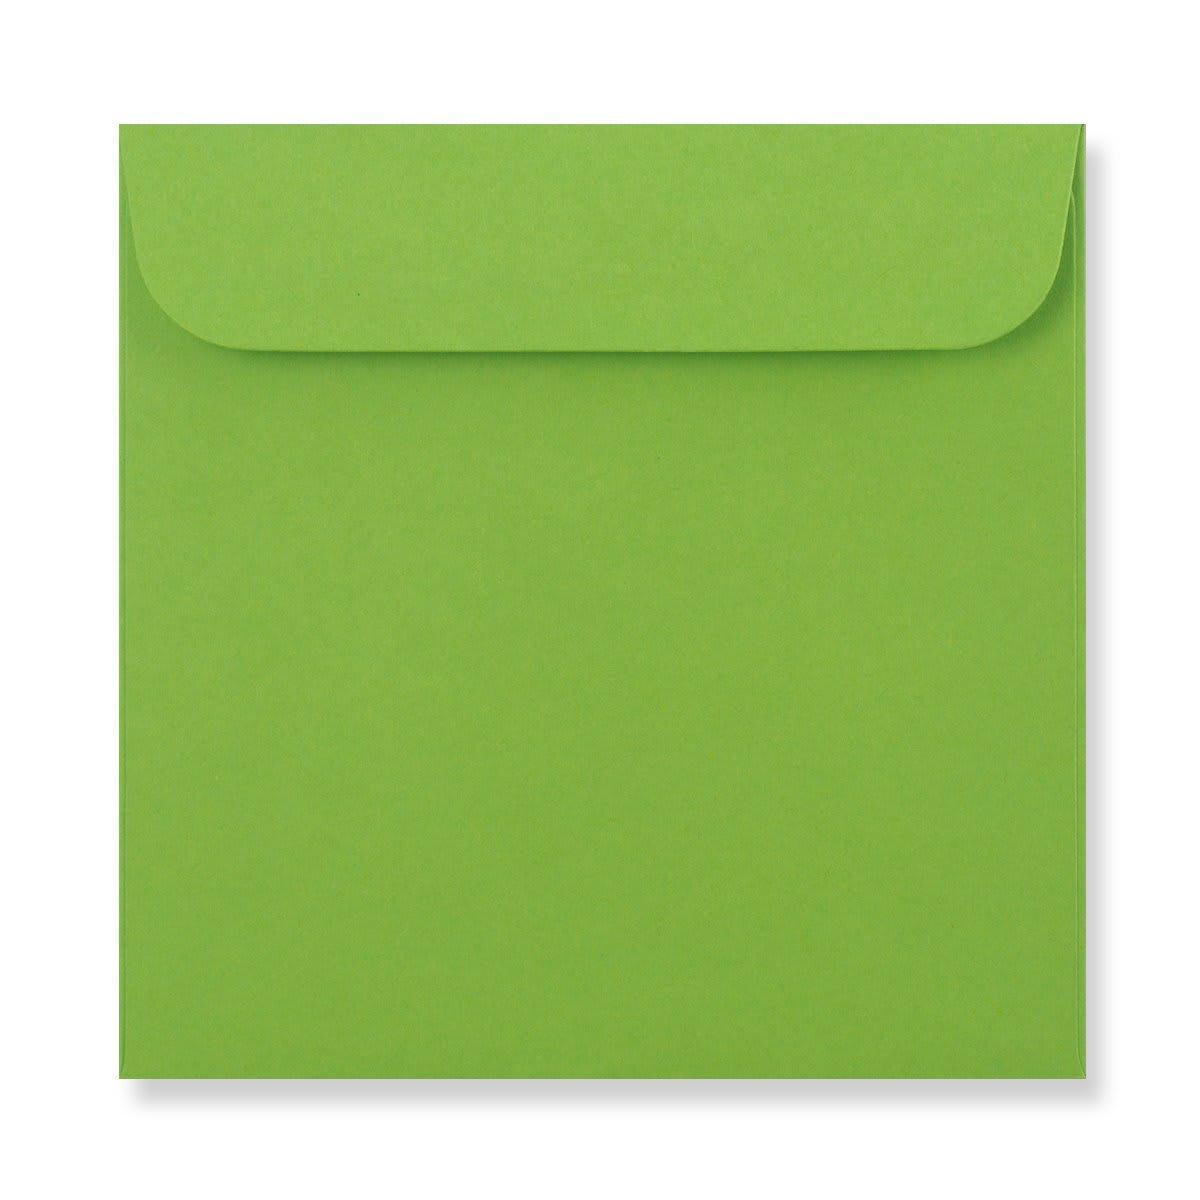 85 x 85mm GREEN MINI CD WINDOW ENVELOPES